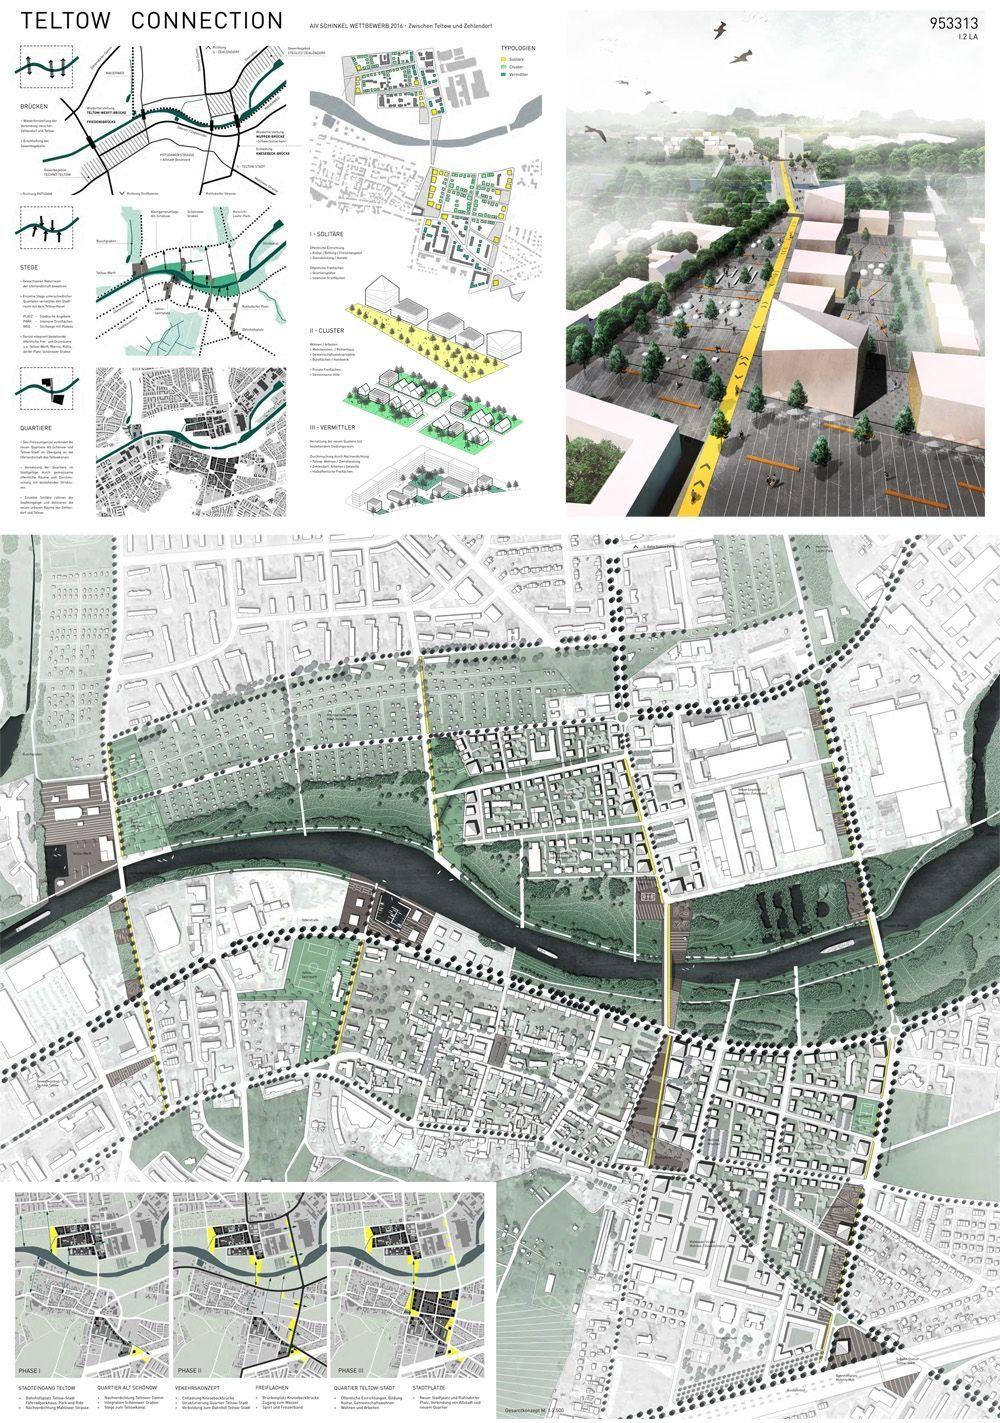 landscape internship | Landscaping Architecture | Urban